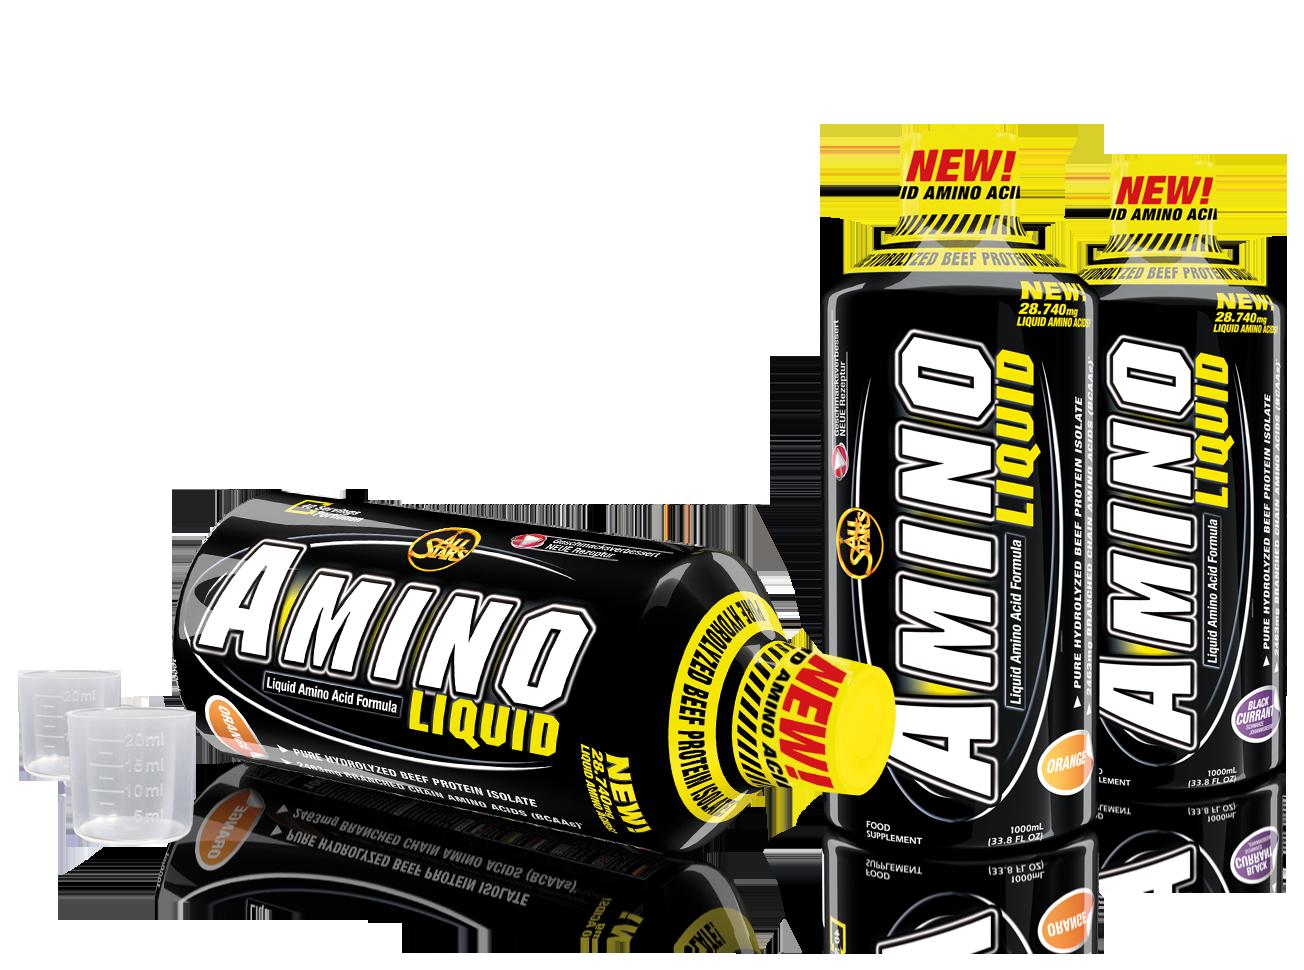 All Stars Amino liquid butelių vaizdas